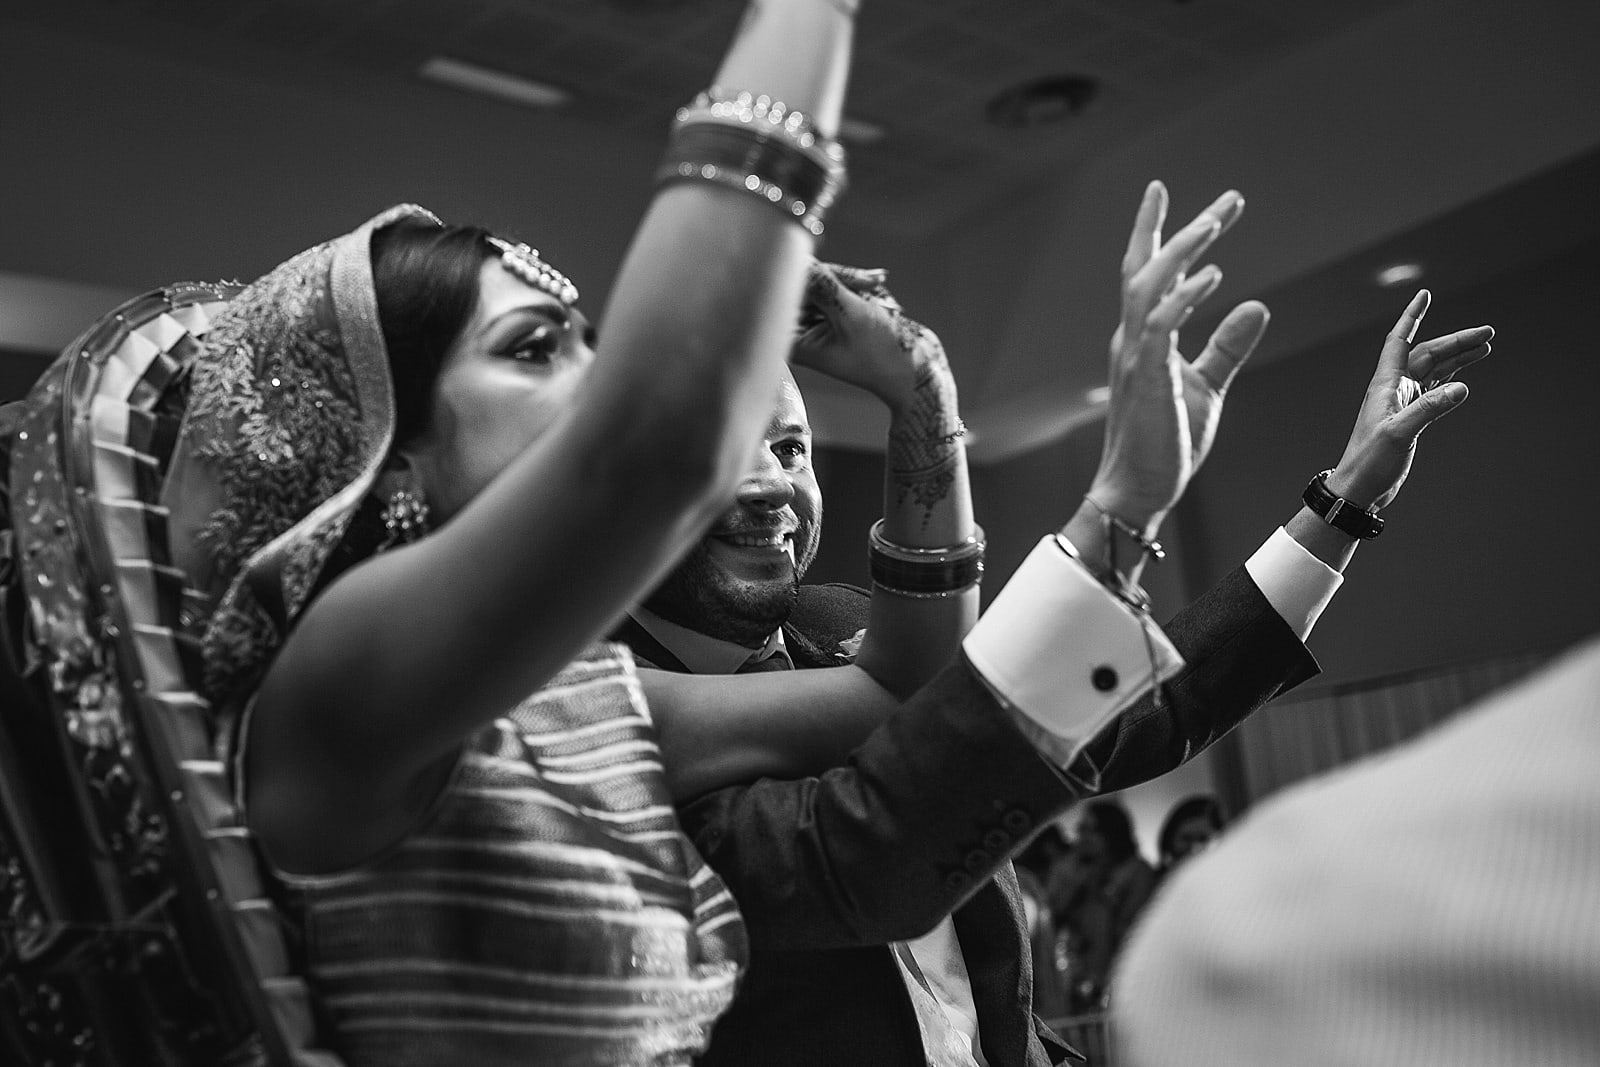 sikh-wedding-photography-birmingham-edgbaston_0148